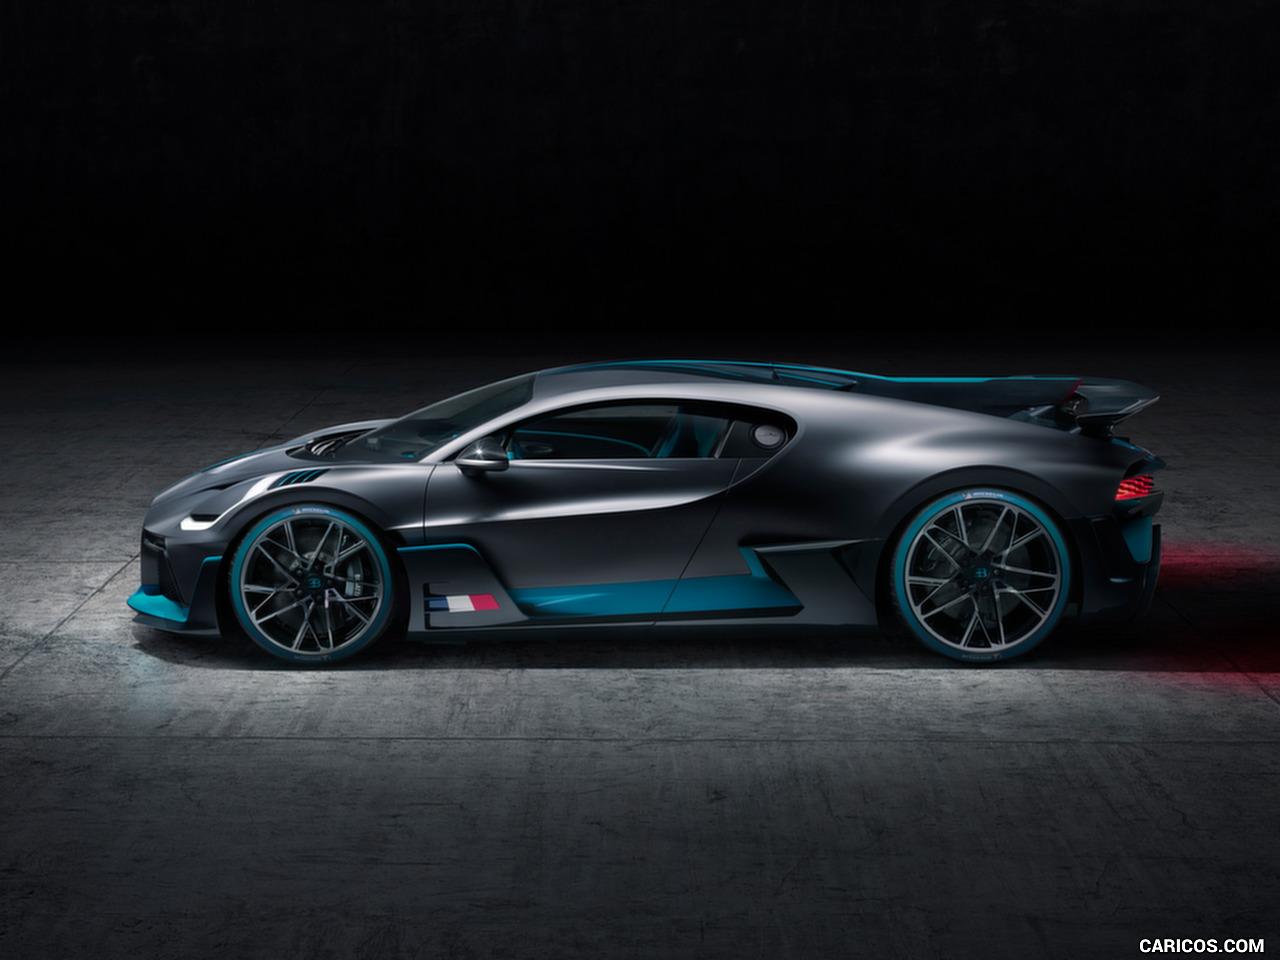 3d Car Wallpaper Full Hd Bugatti Divo Wallpaper Hd Wallpapers Pulse